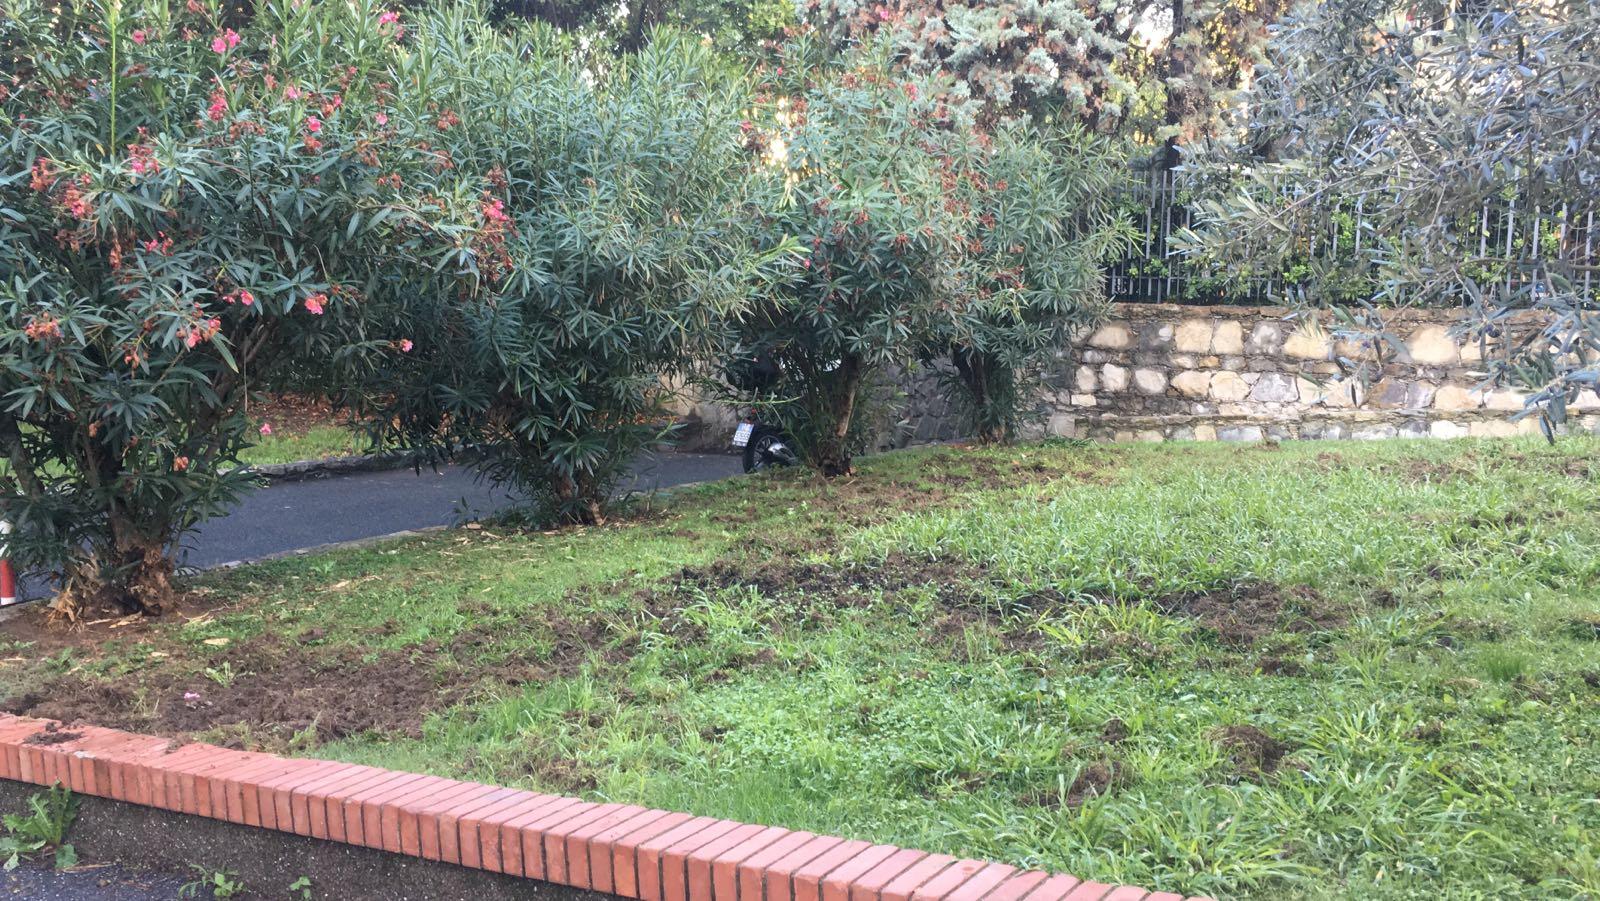 Cinghiali distruggono giardini ad albaro twebnews - Il giardino di albaro ...